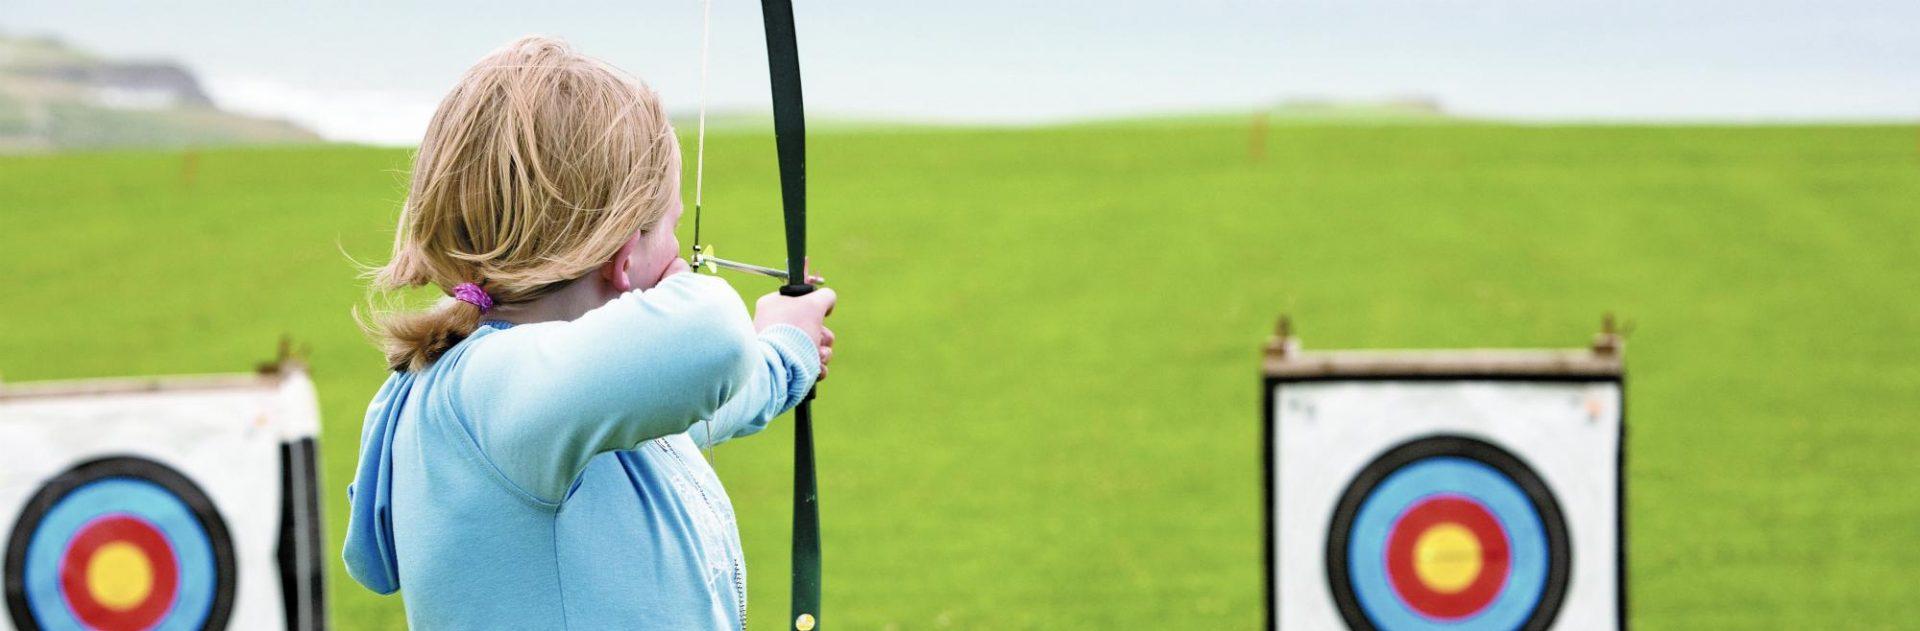 Archery at JCA Centre